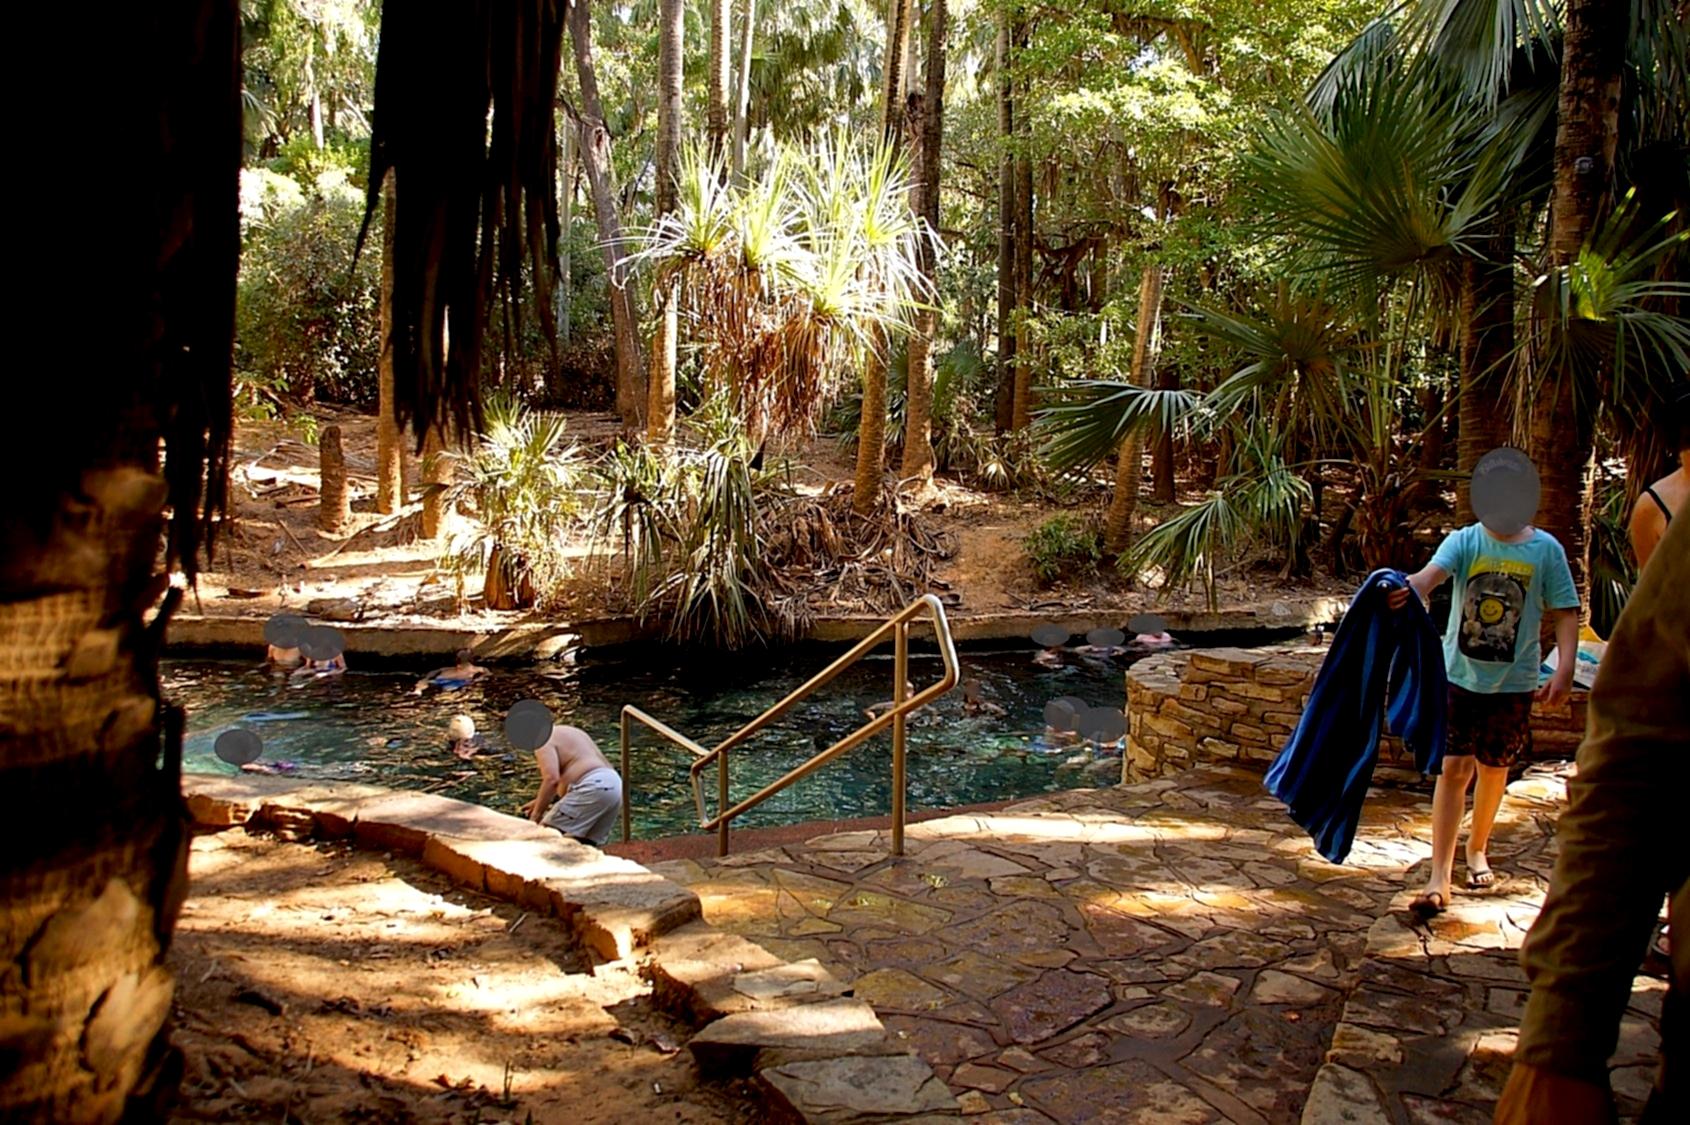 Das Baden in den Thermal Pools bei Mataranka soll bei Zipperlein helfen.